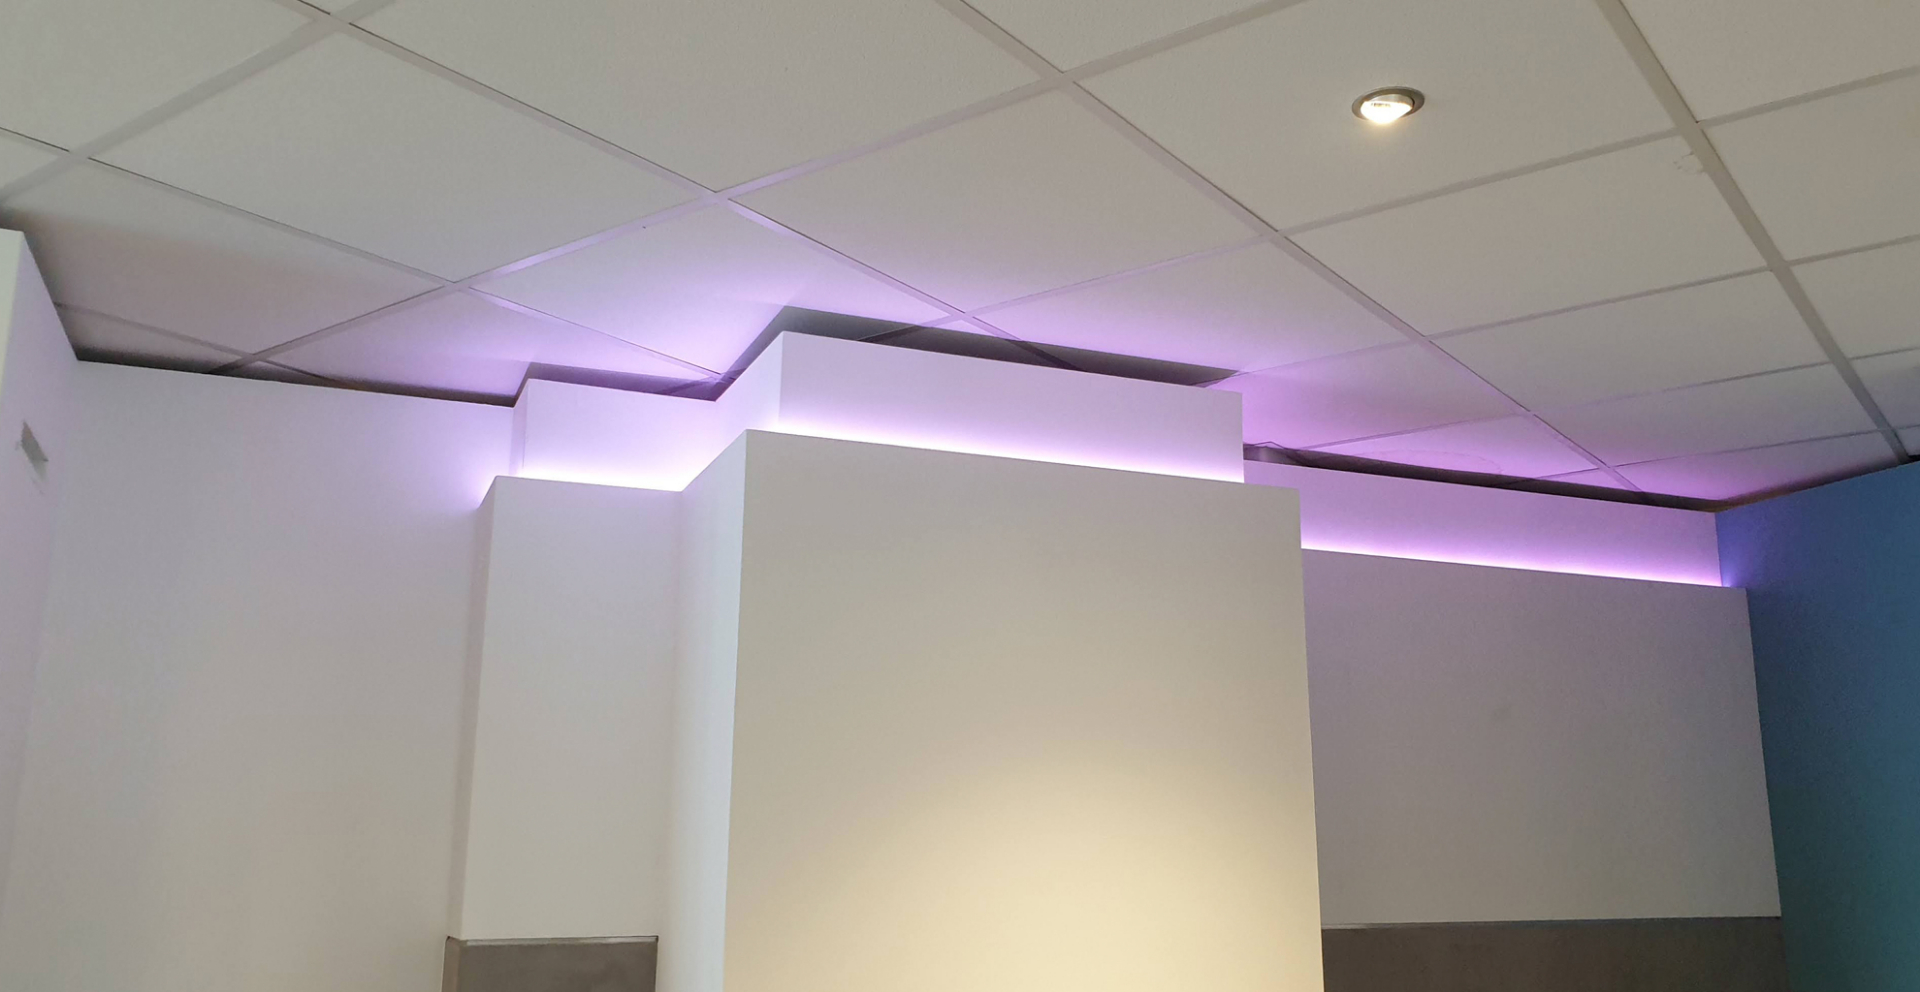 plafonds-5.jpg